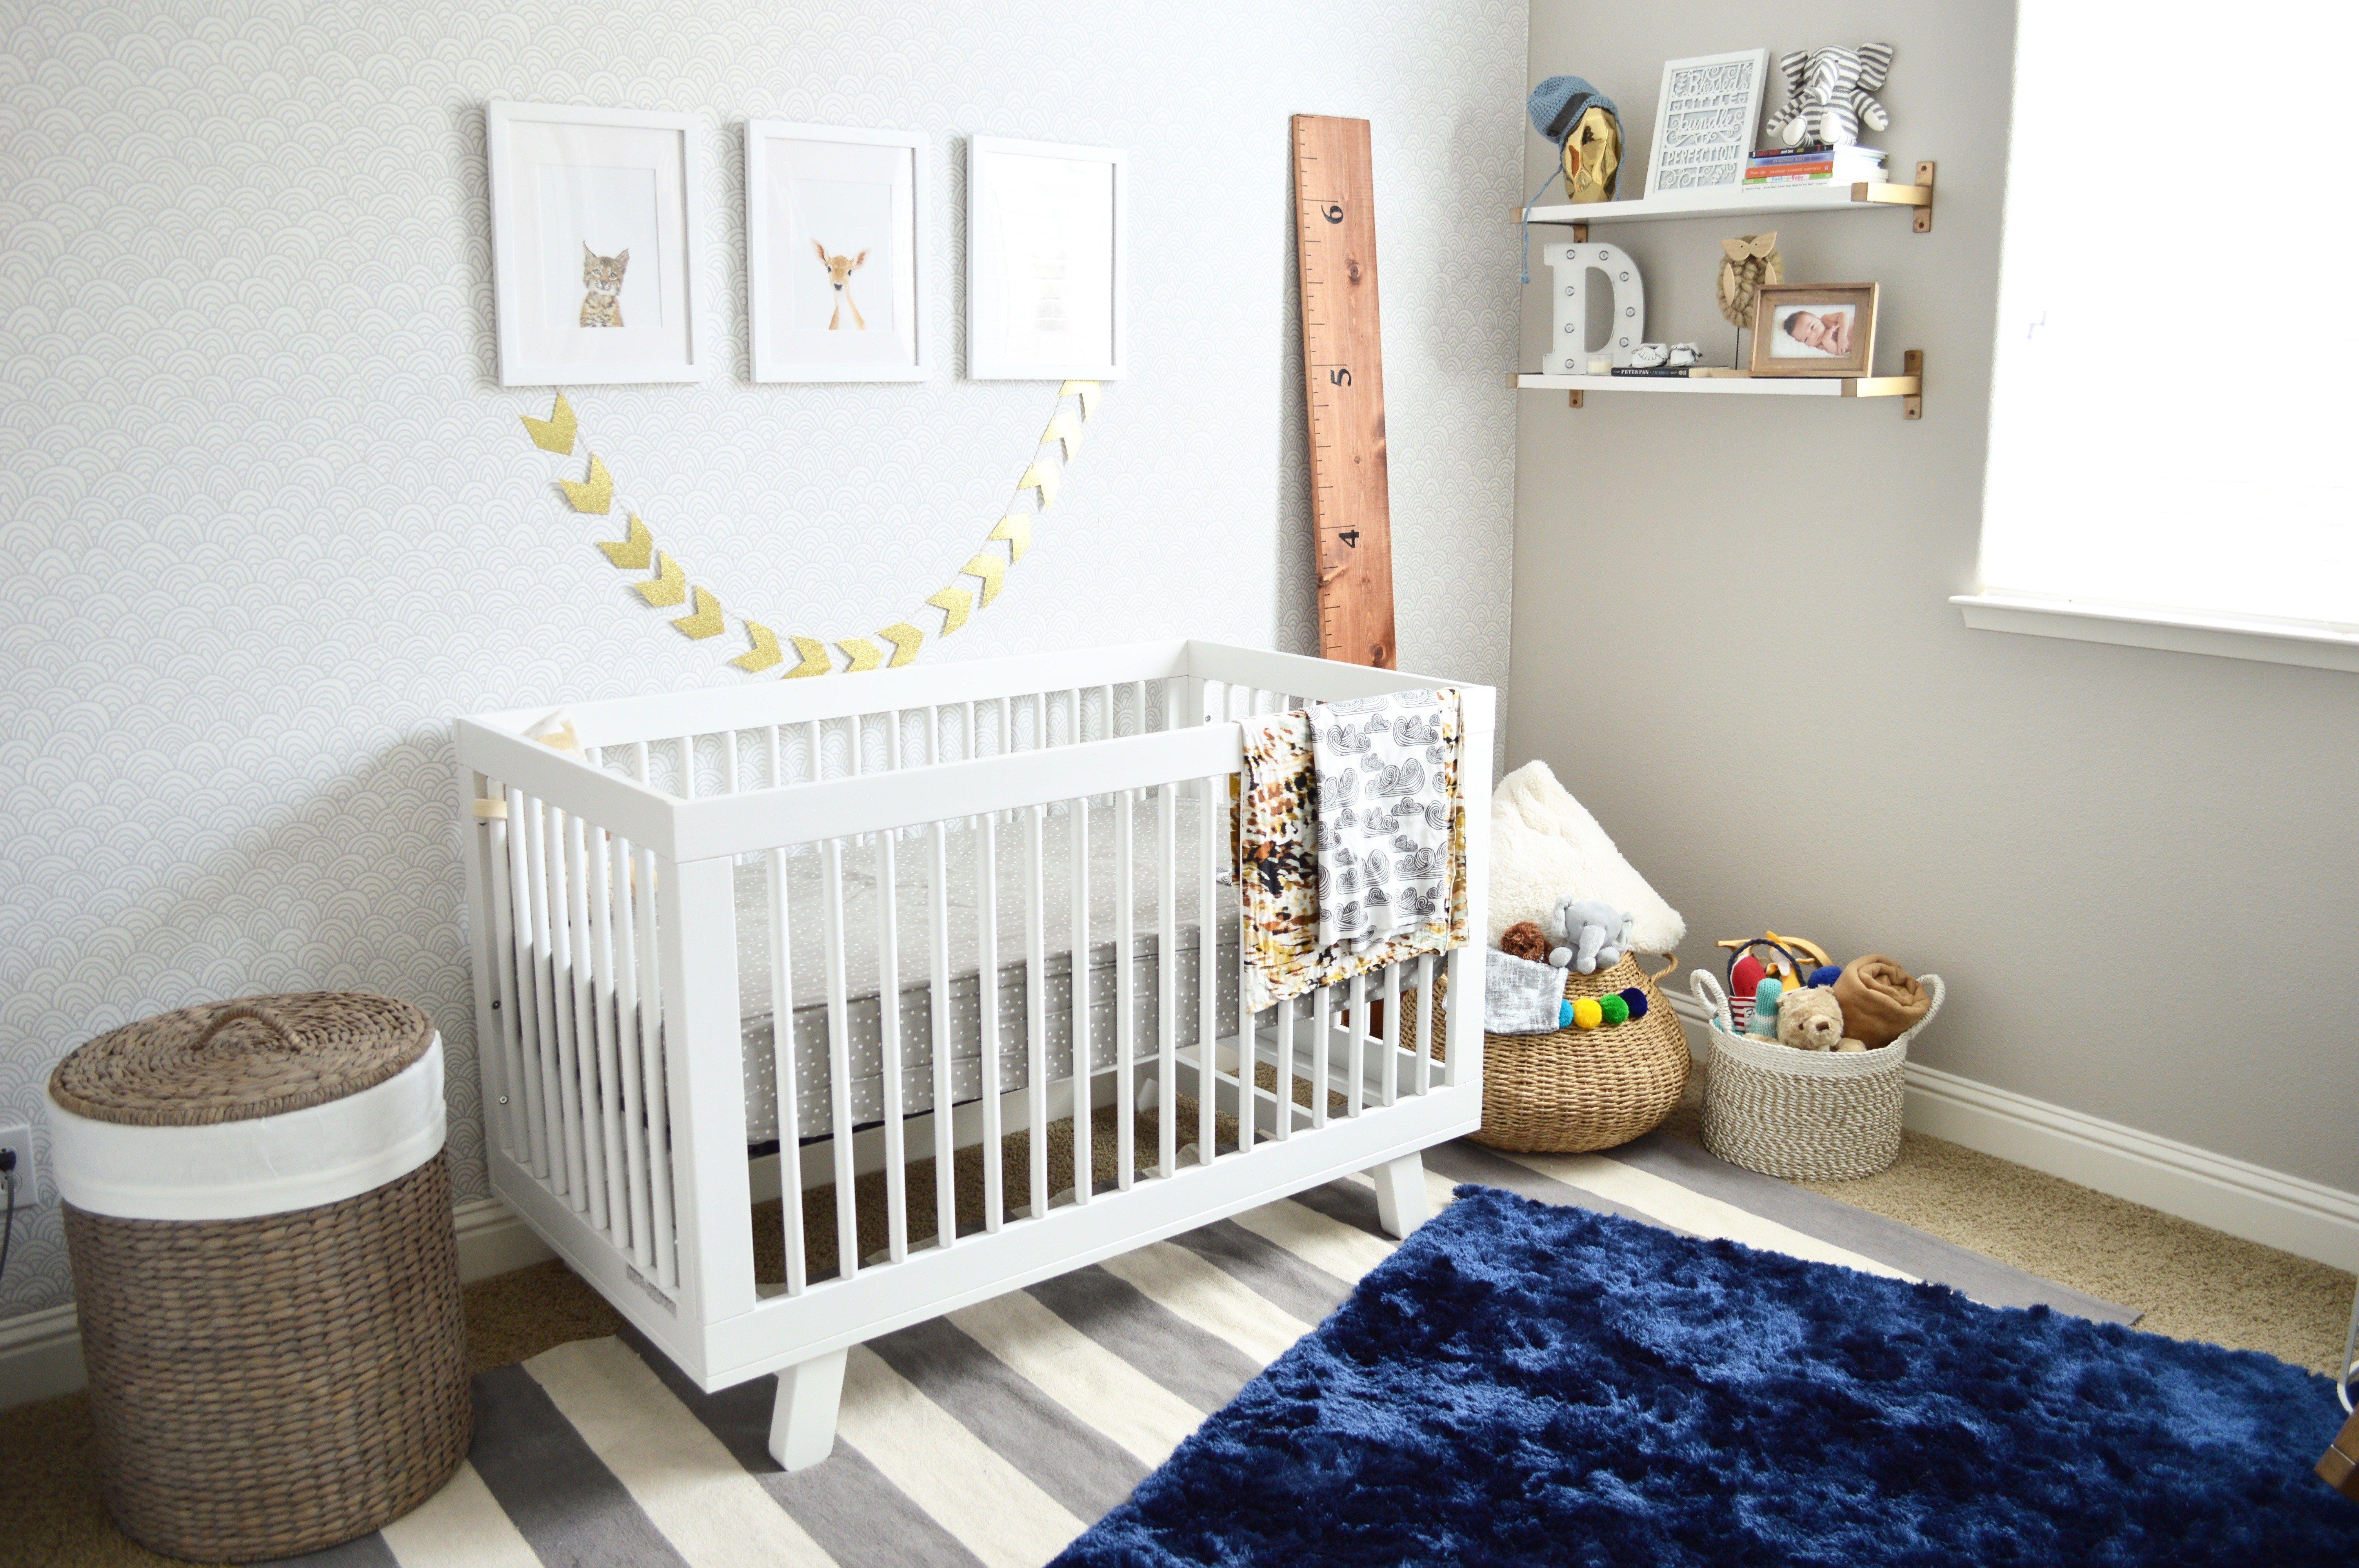 Babyzimmer Modern ~ Baby nursery boy nursery modern nursery babyletto hudson crib